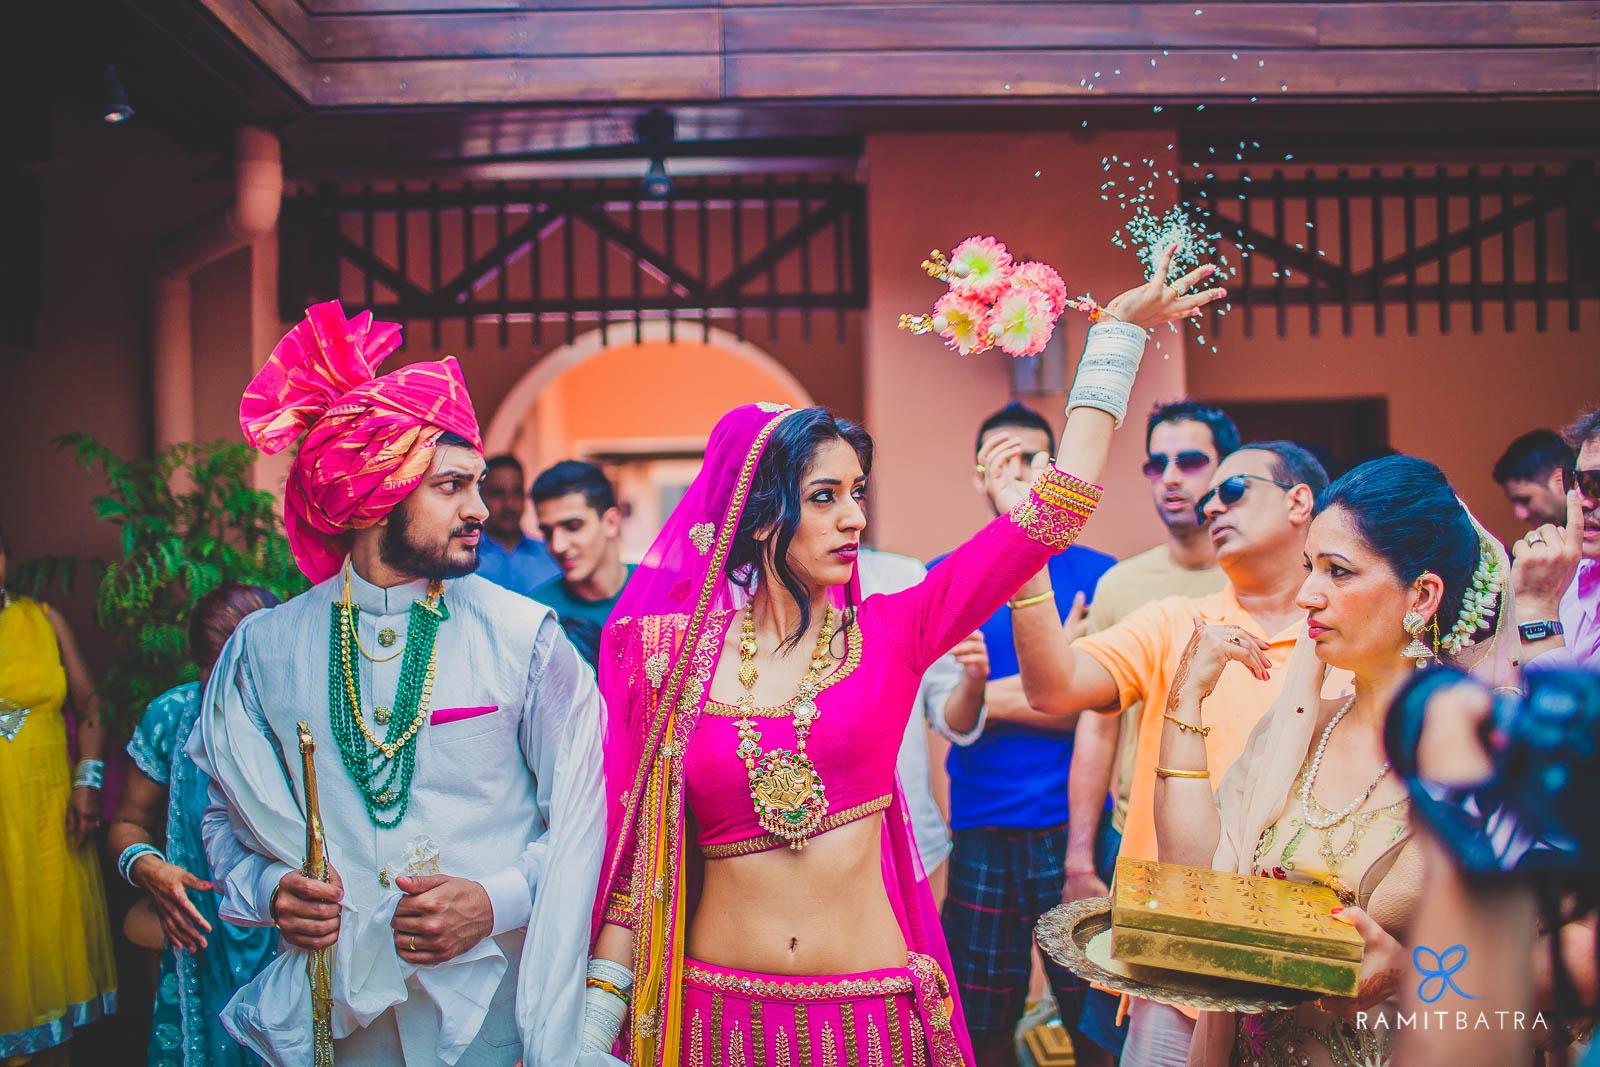 Punjabi Wedding - Bidai at Park Hyatt Resort and Spa, Goa